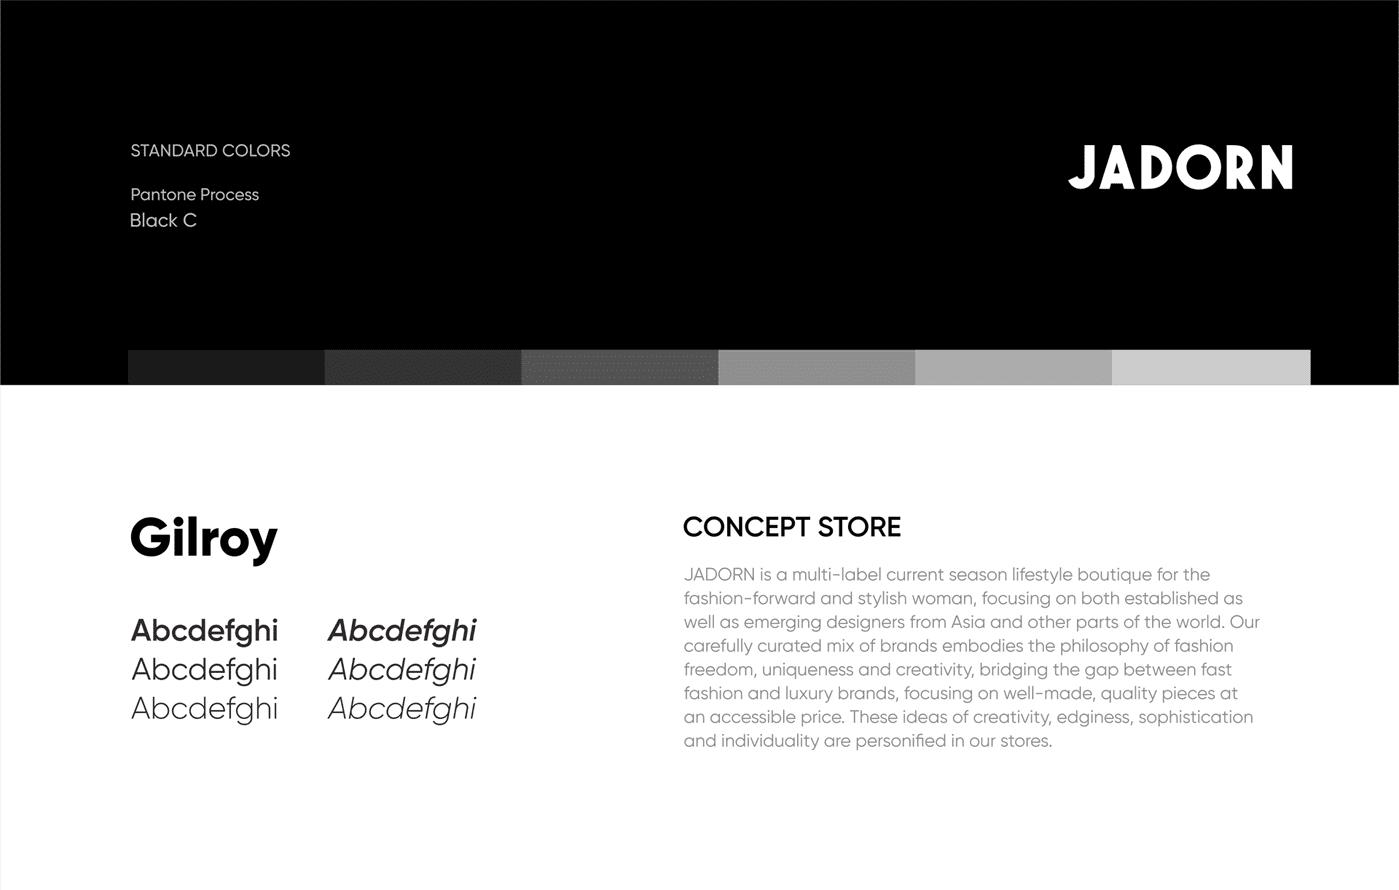 JADORN时尚女装品牌广告-02